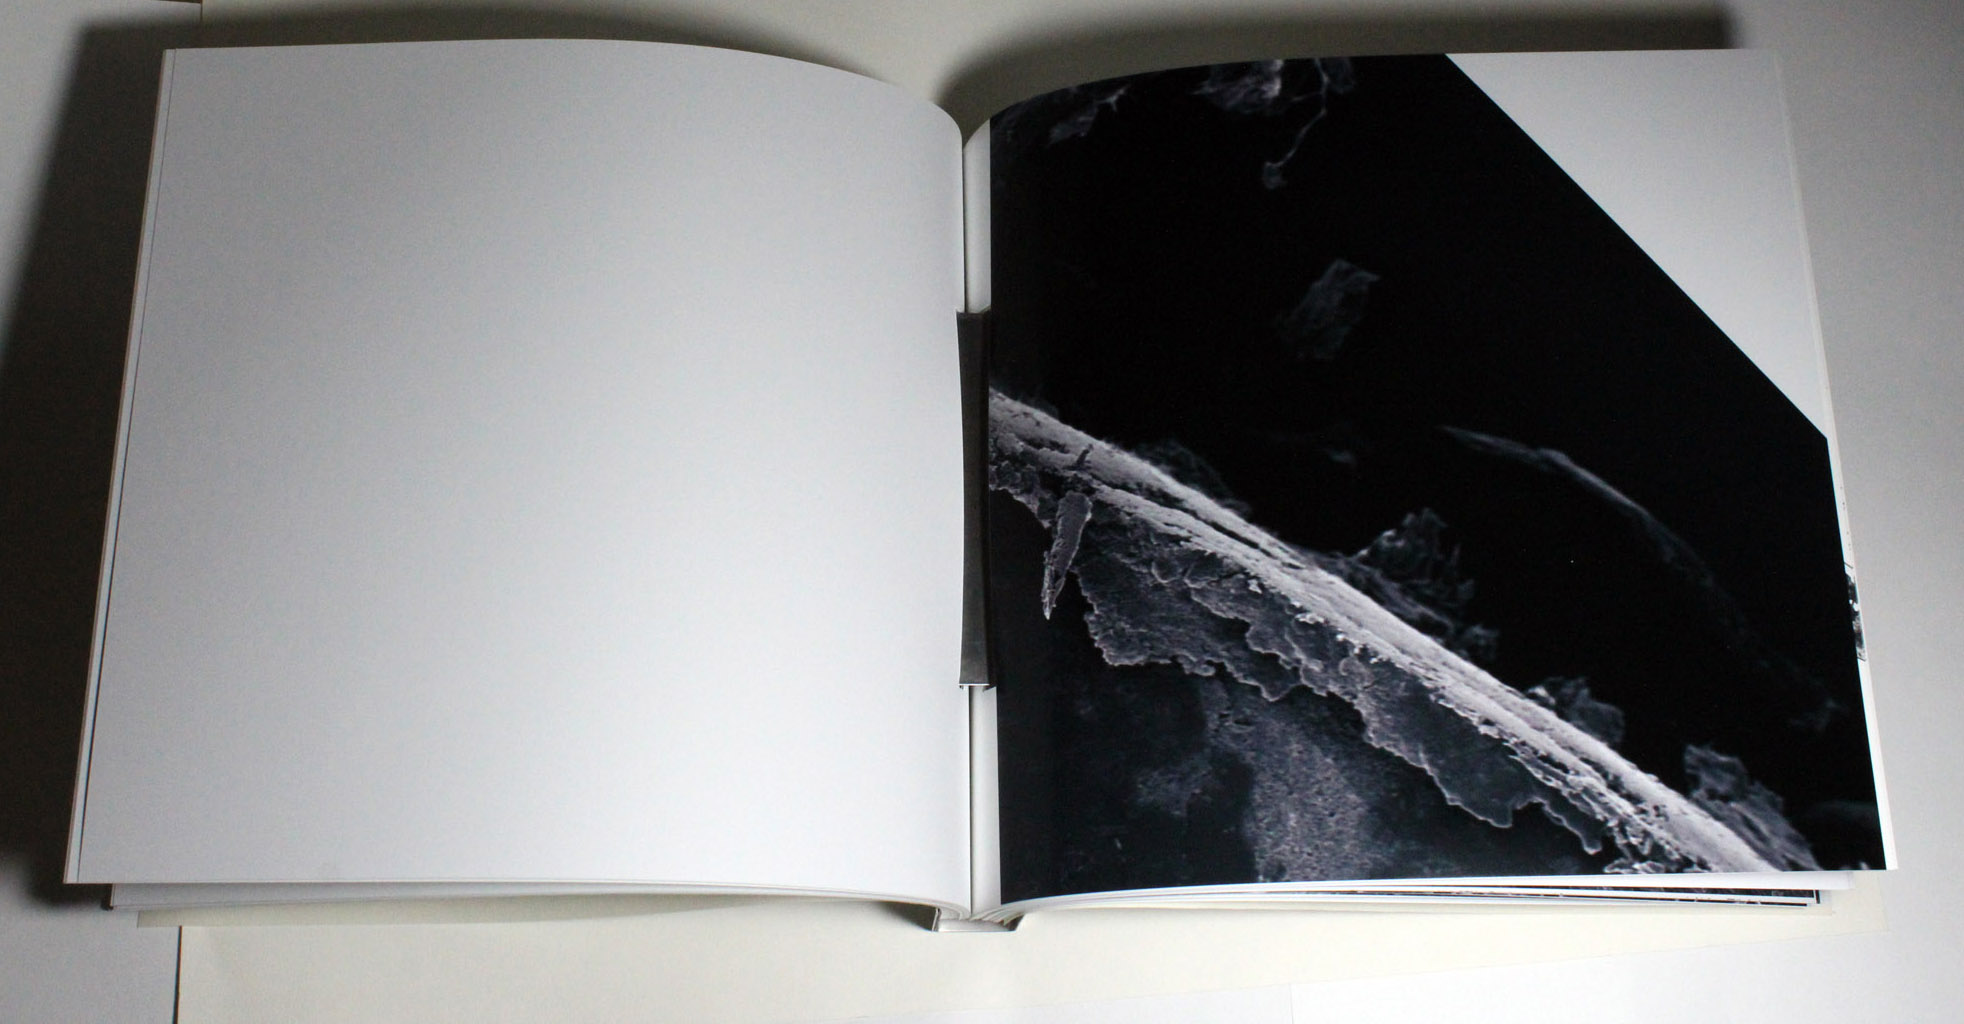 Edge of carbon paper